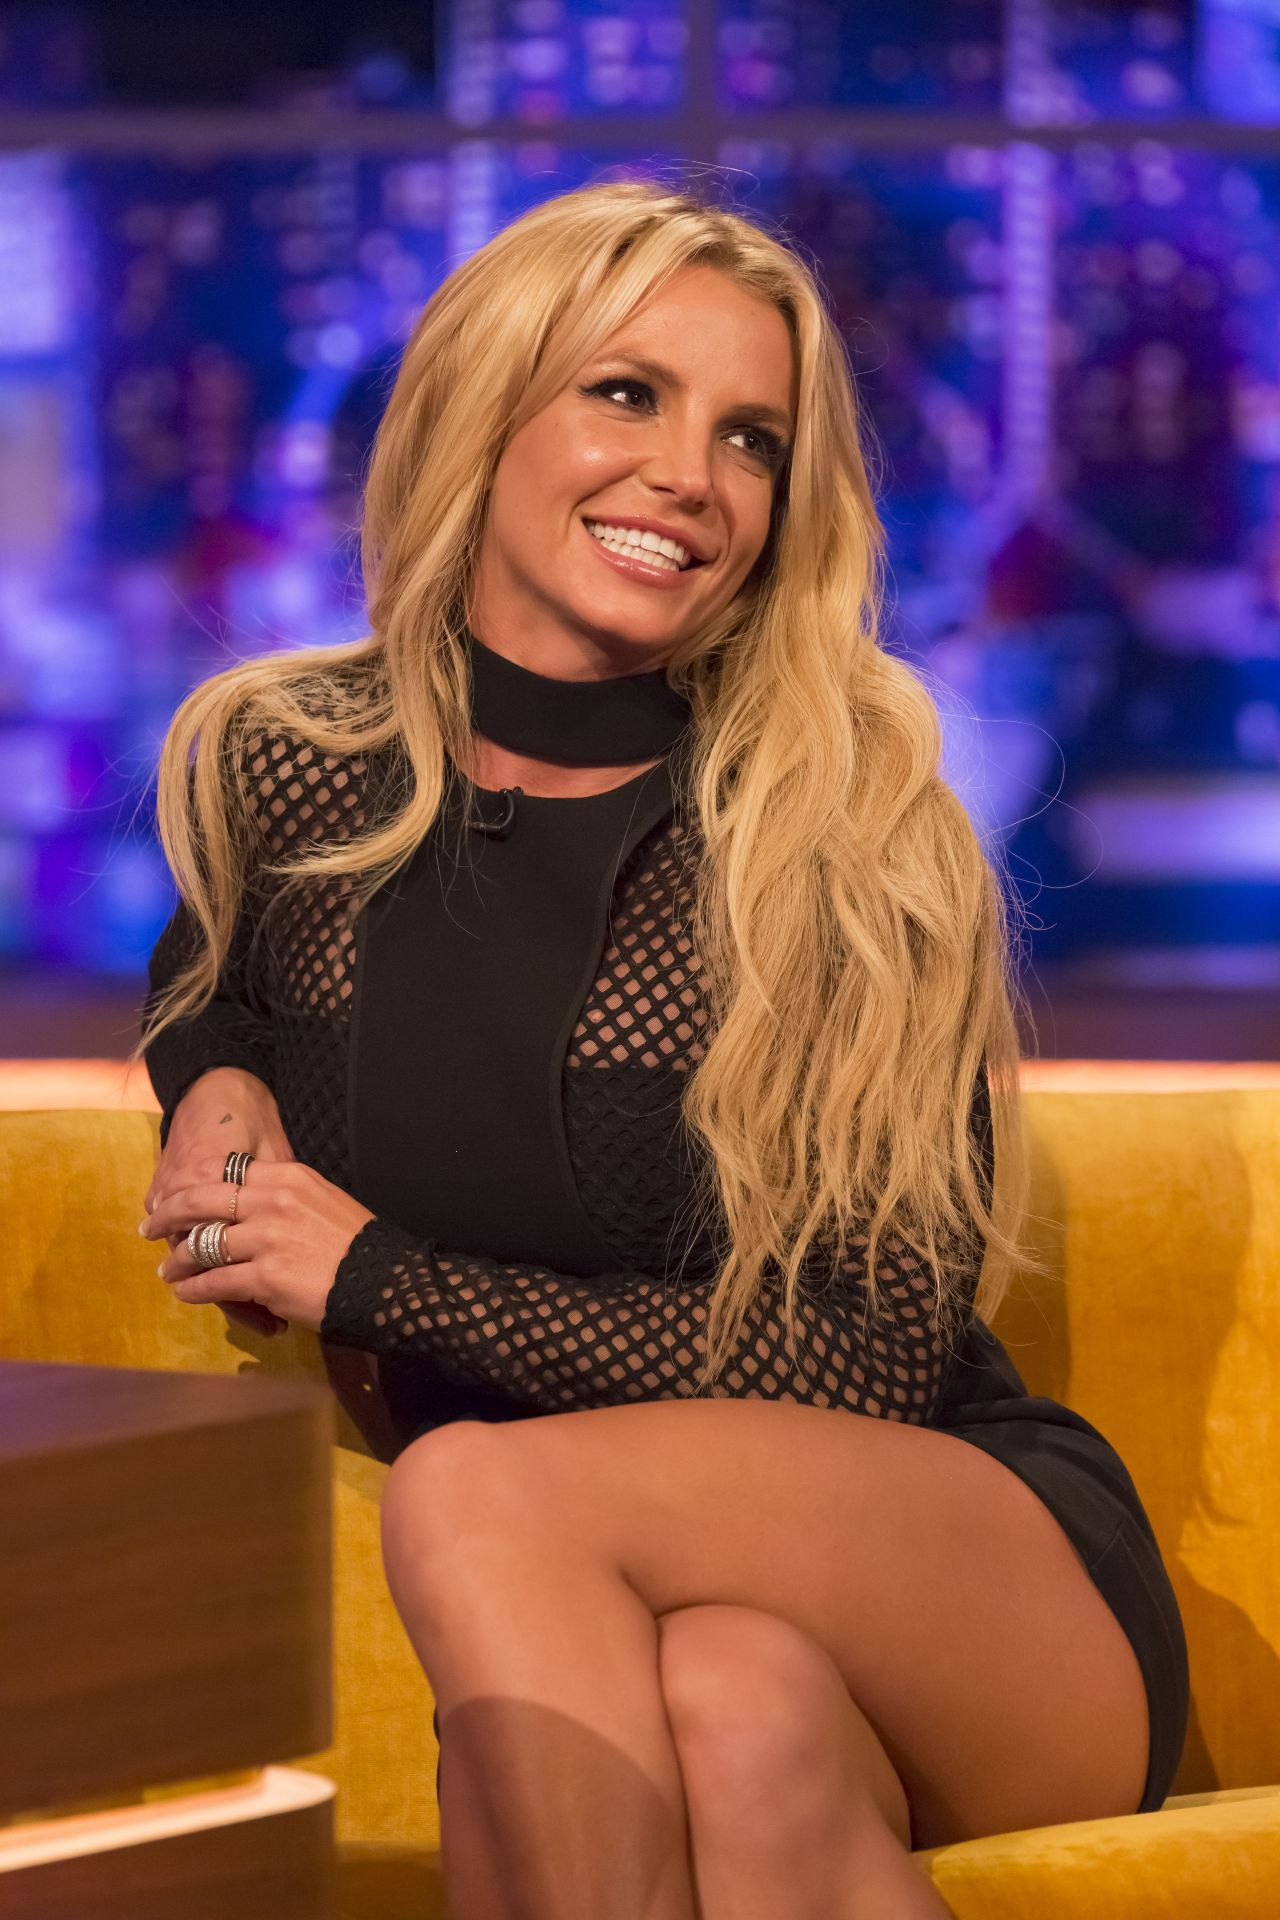 Britney Spears ... Britney Spears